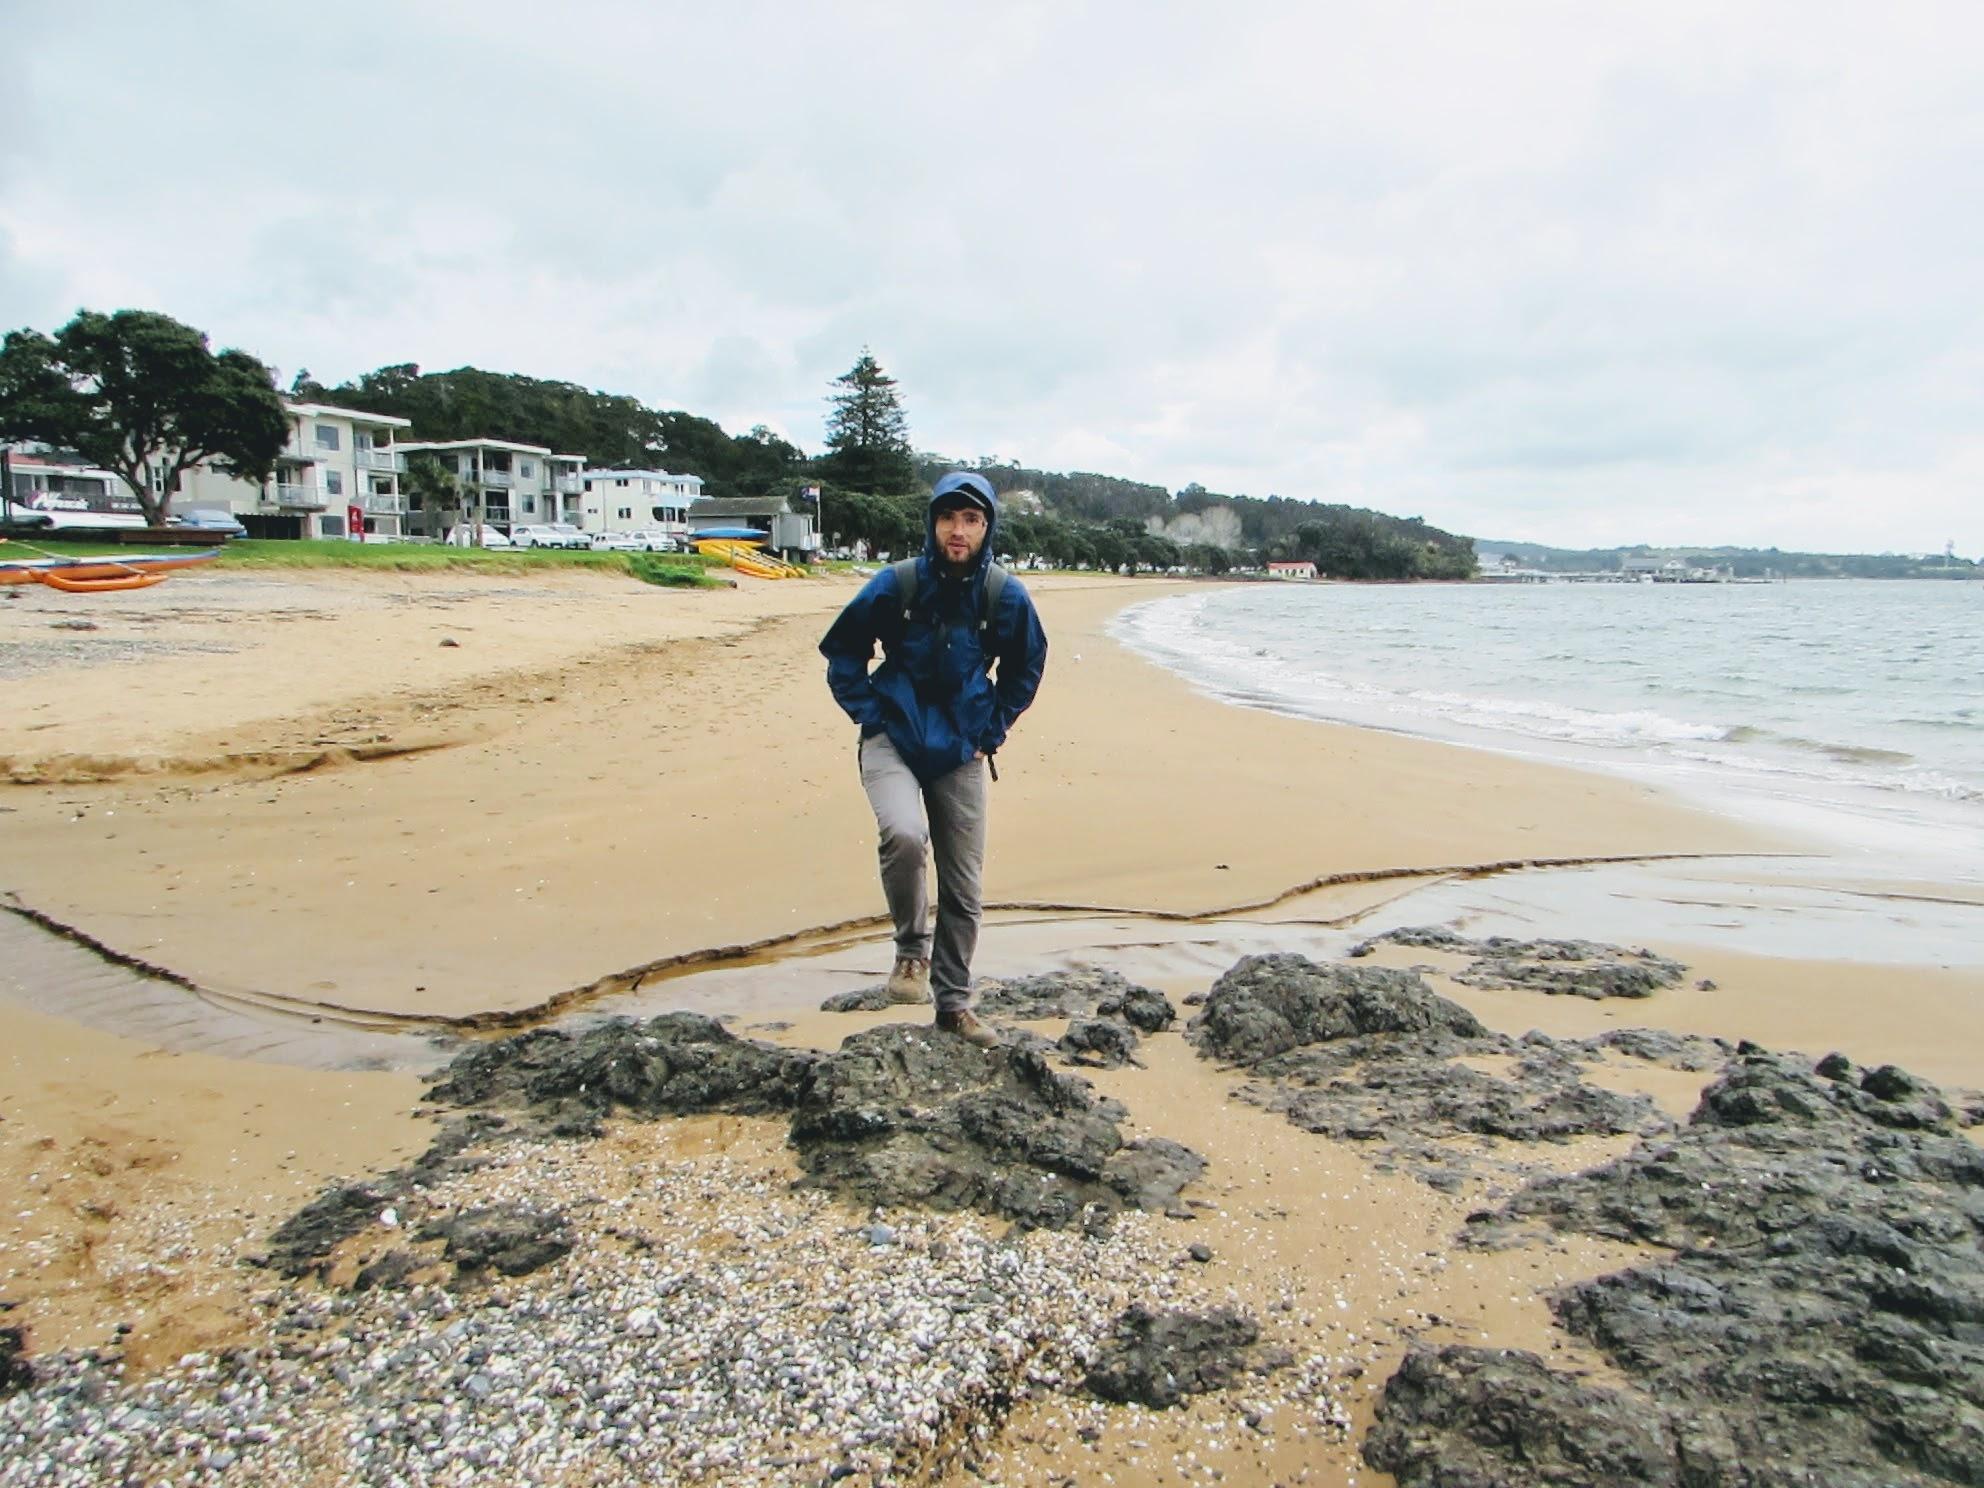 Emmett on a typical New Zealand rainy day on Paihia's beach.